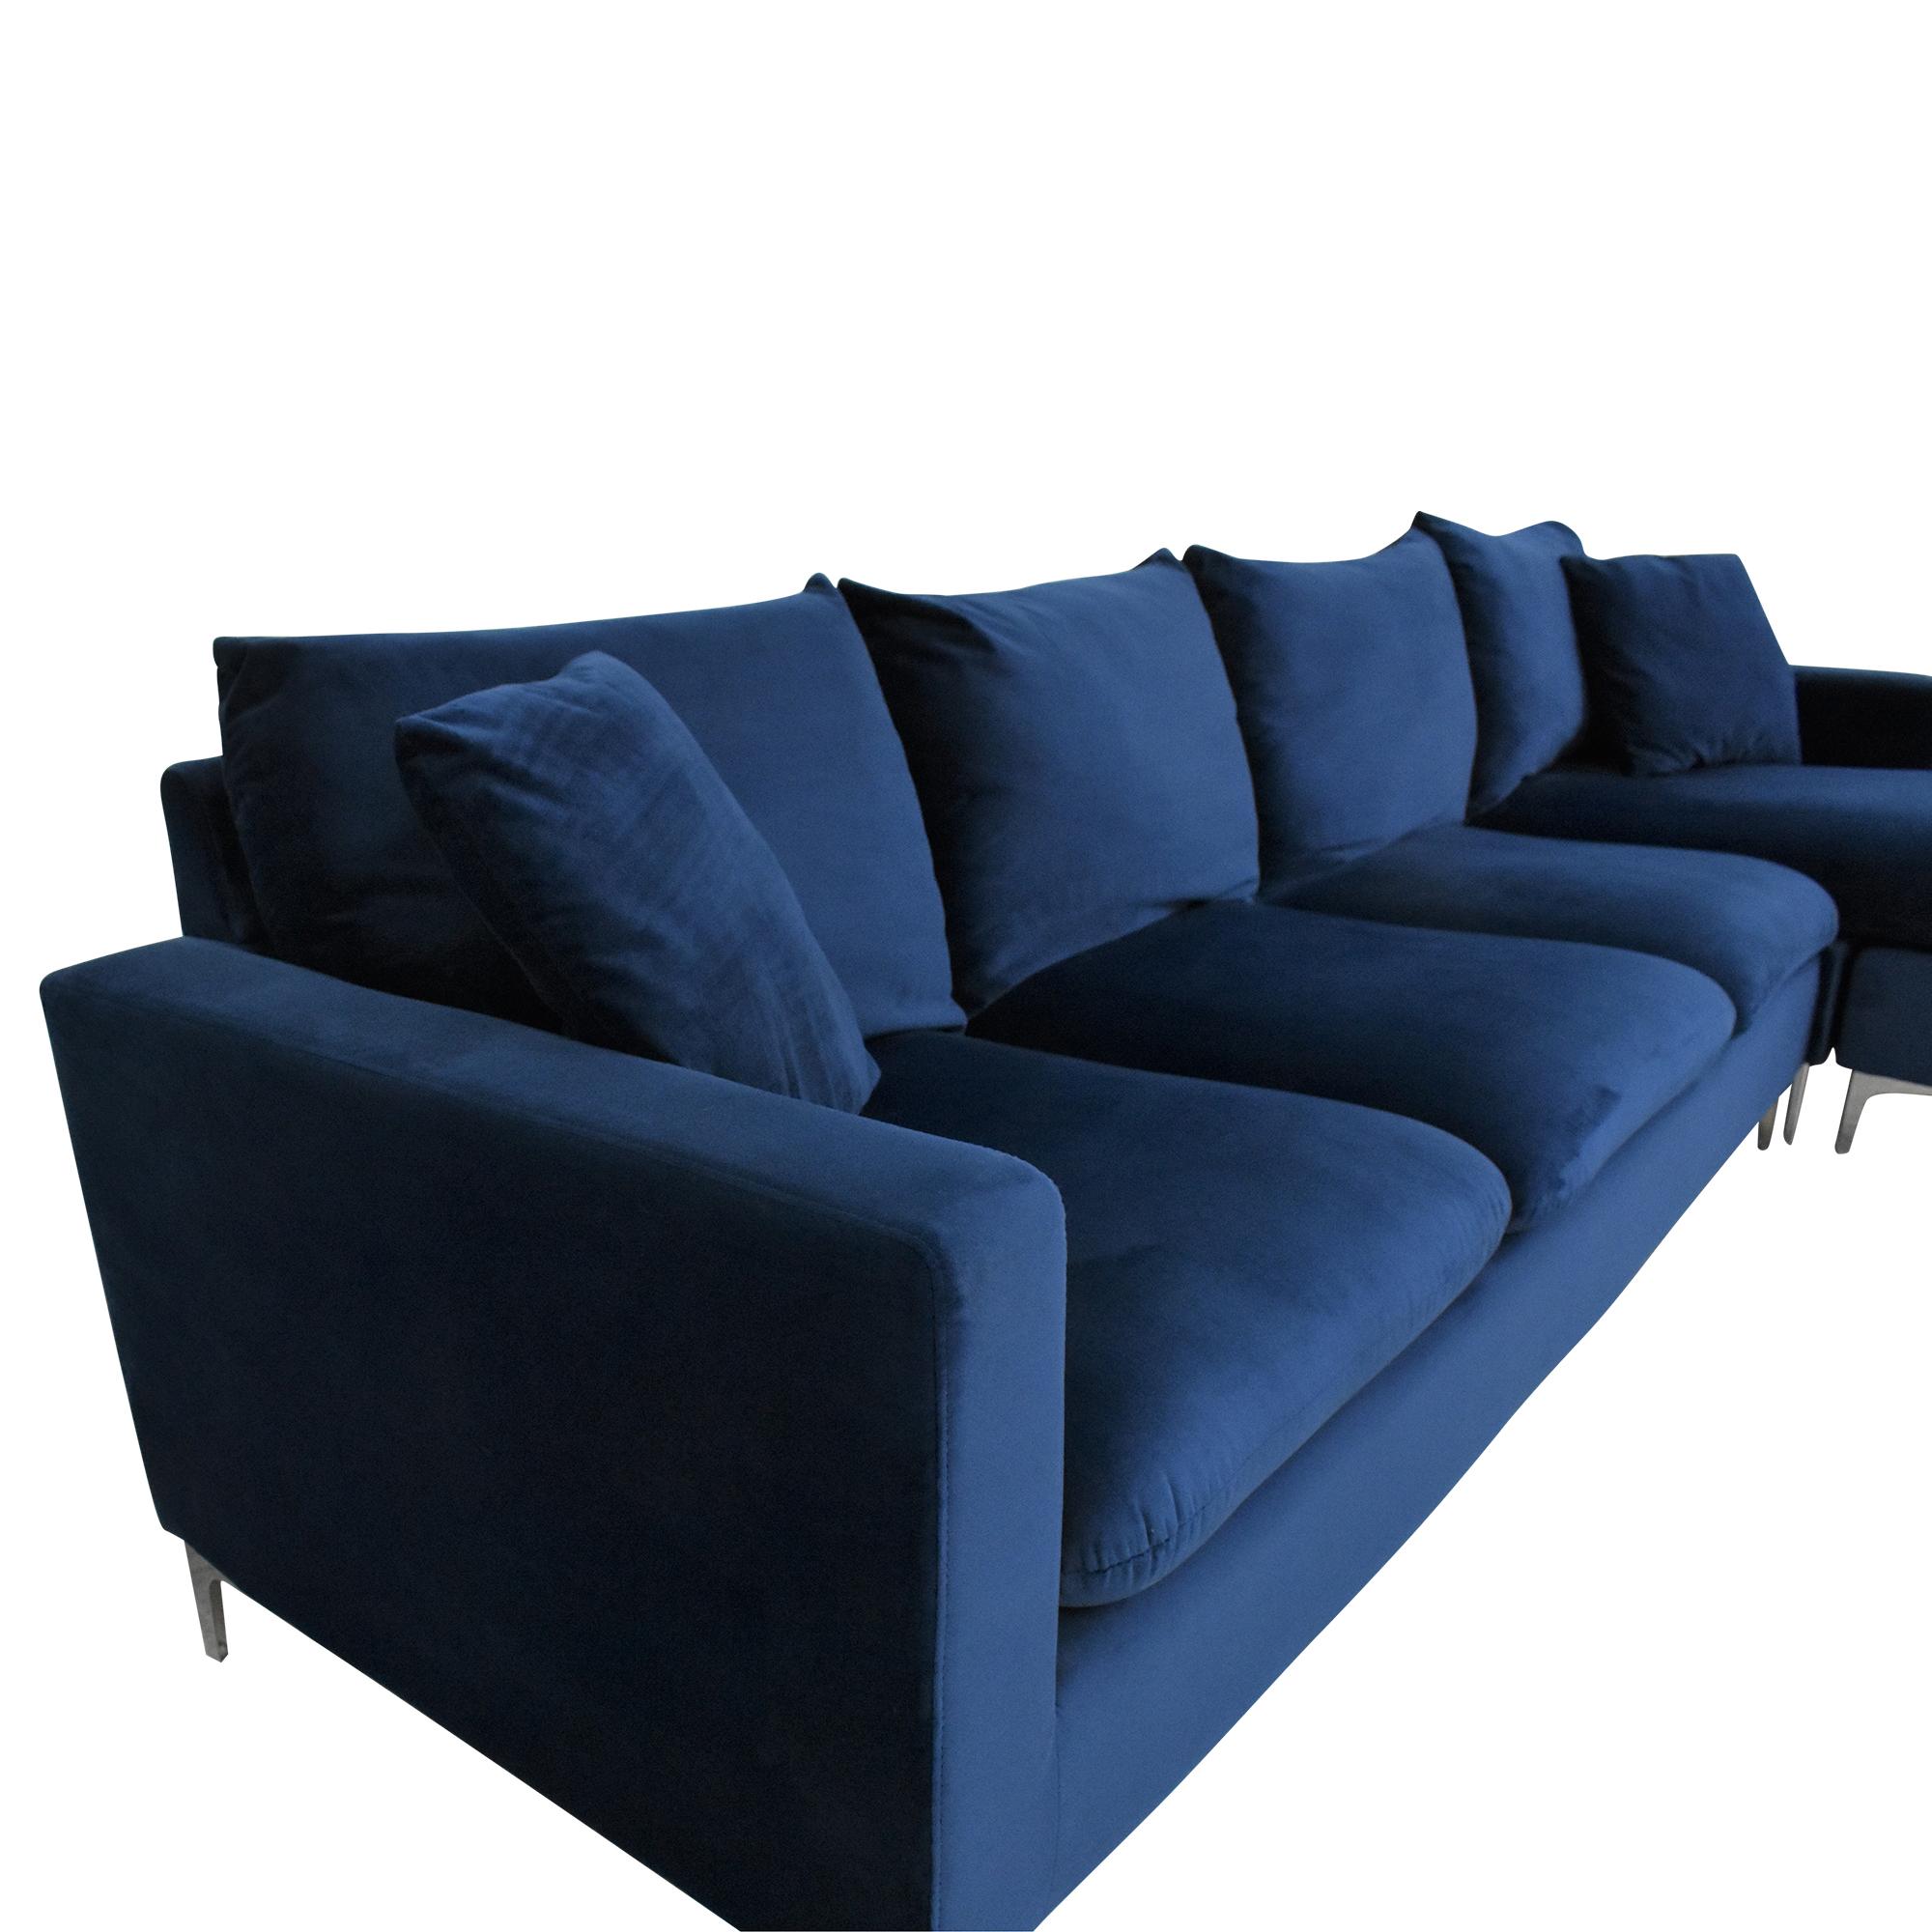 shop Wayfair Wayfair Boutwell Reversible Sectional Sofa online